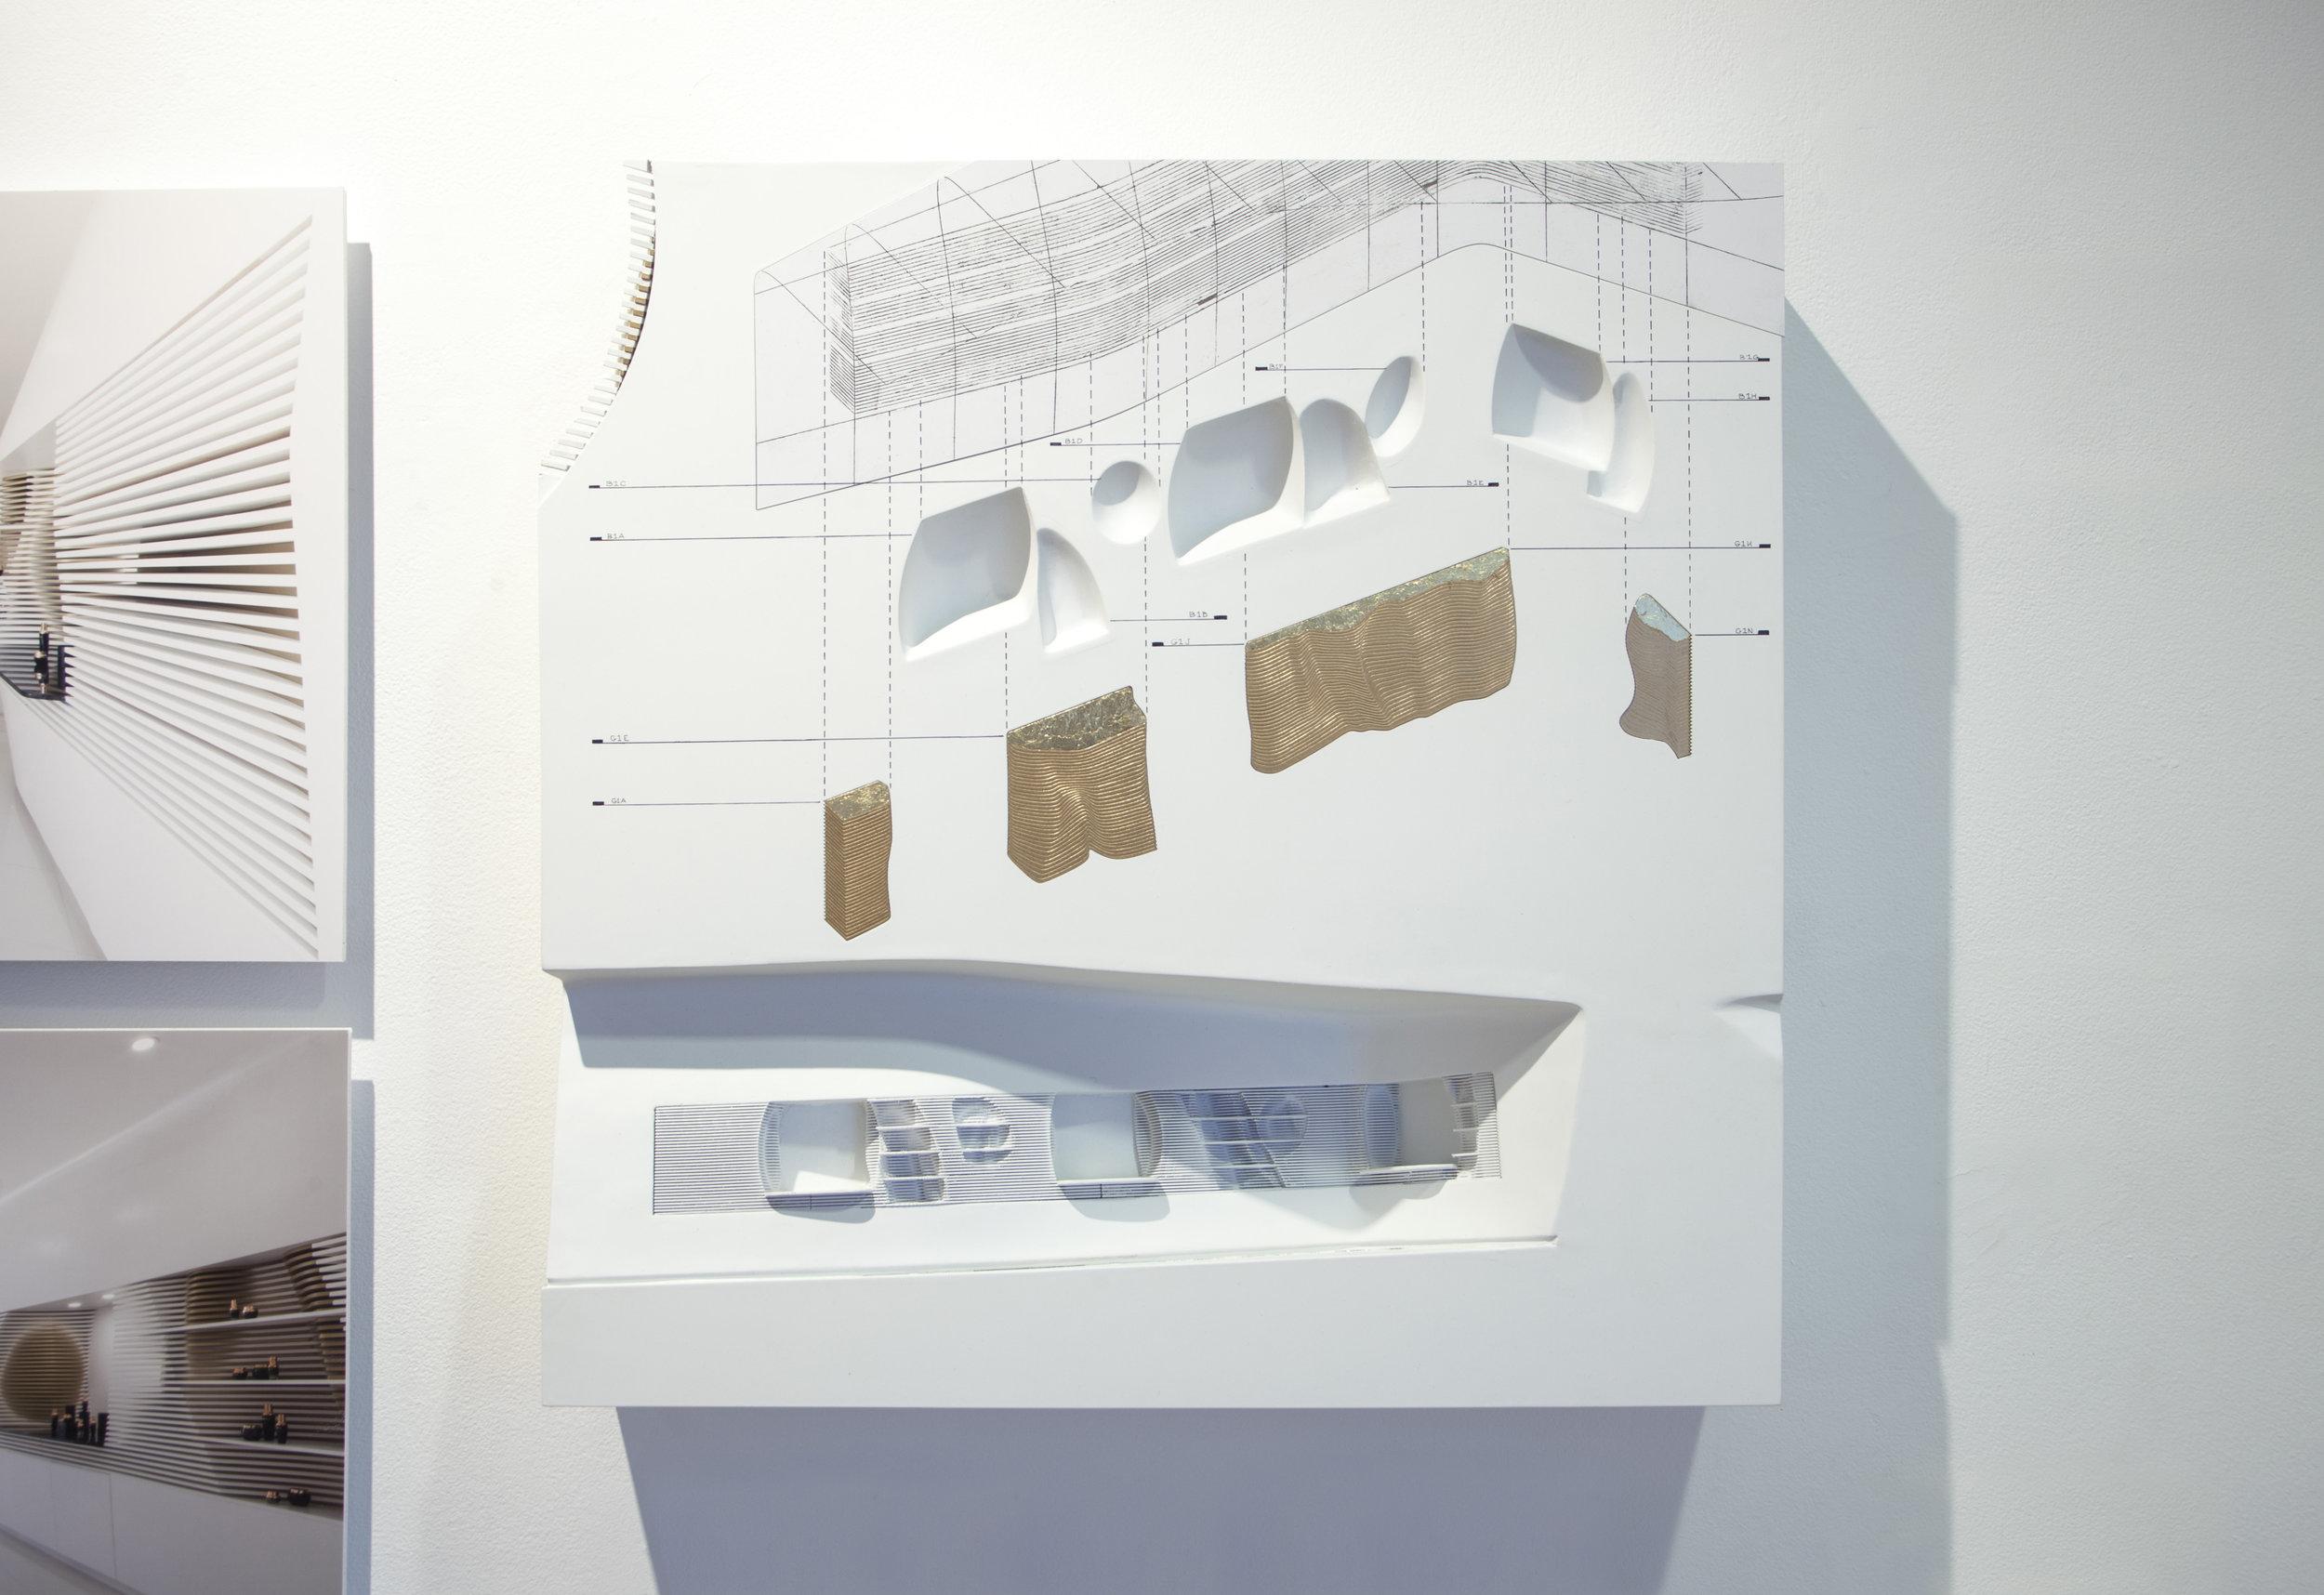 Open Source Architecture, Rajeunir